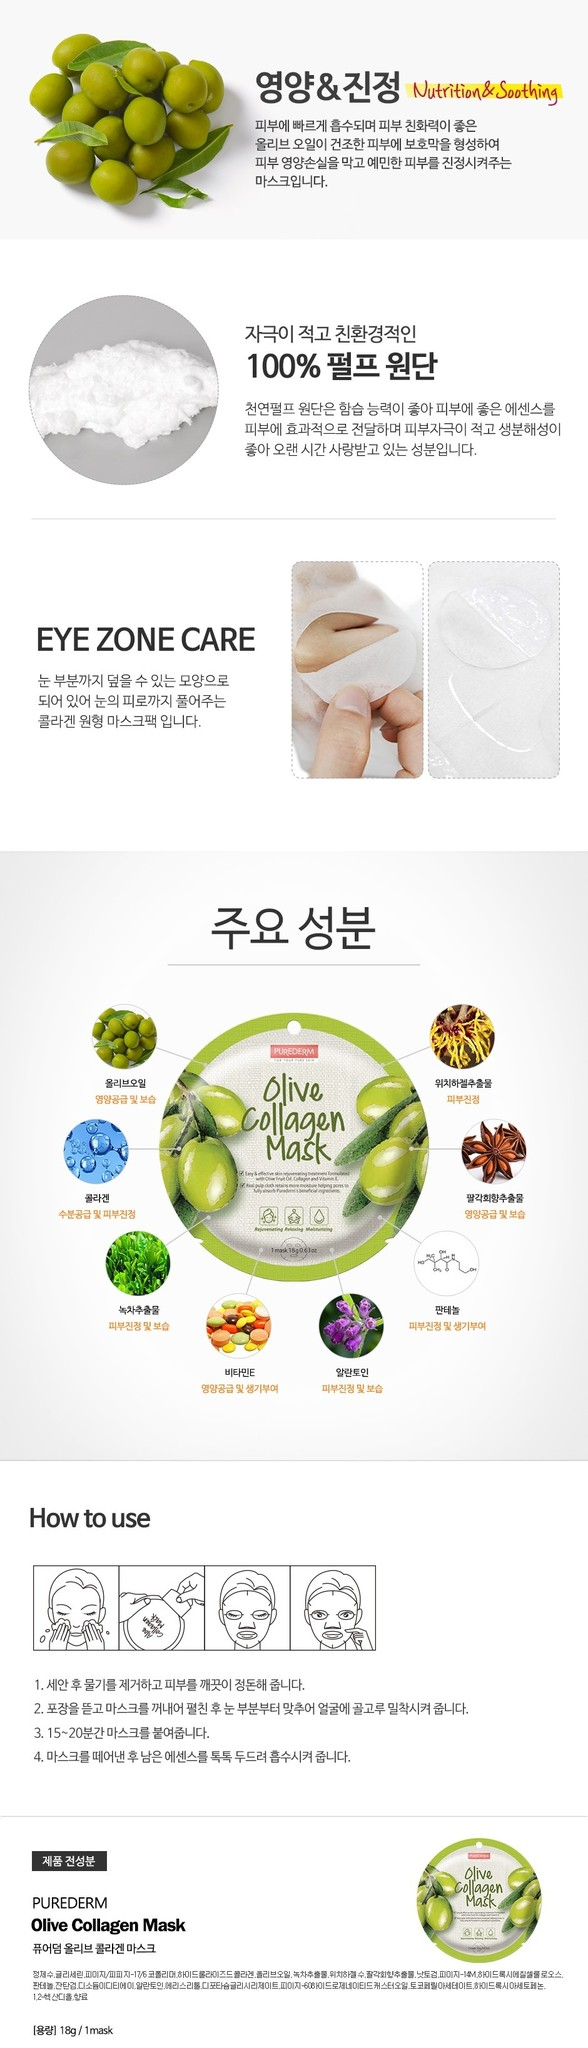 Circle Mask - Olive Collagen-3